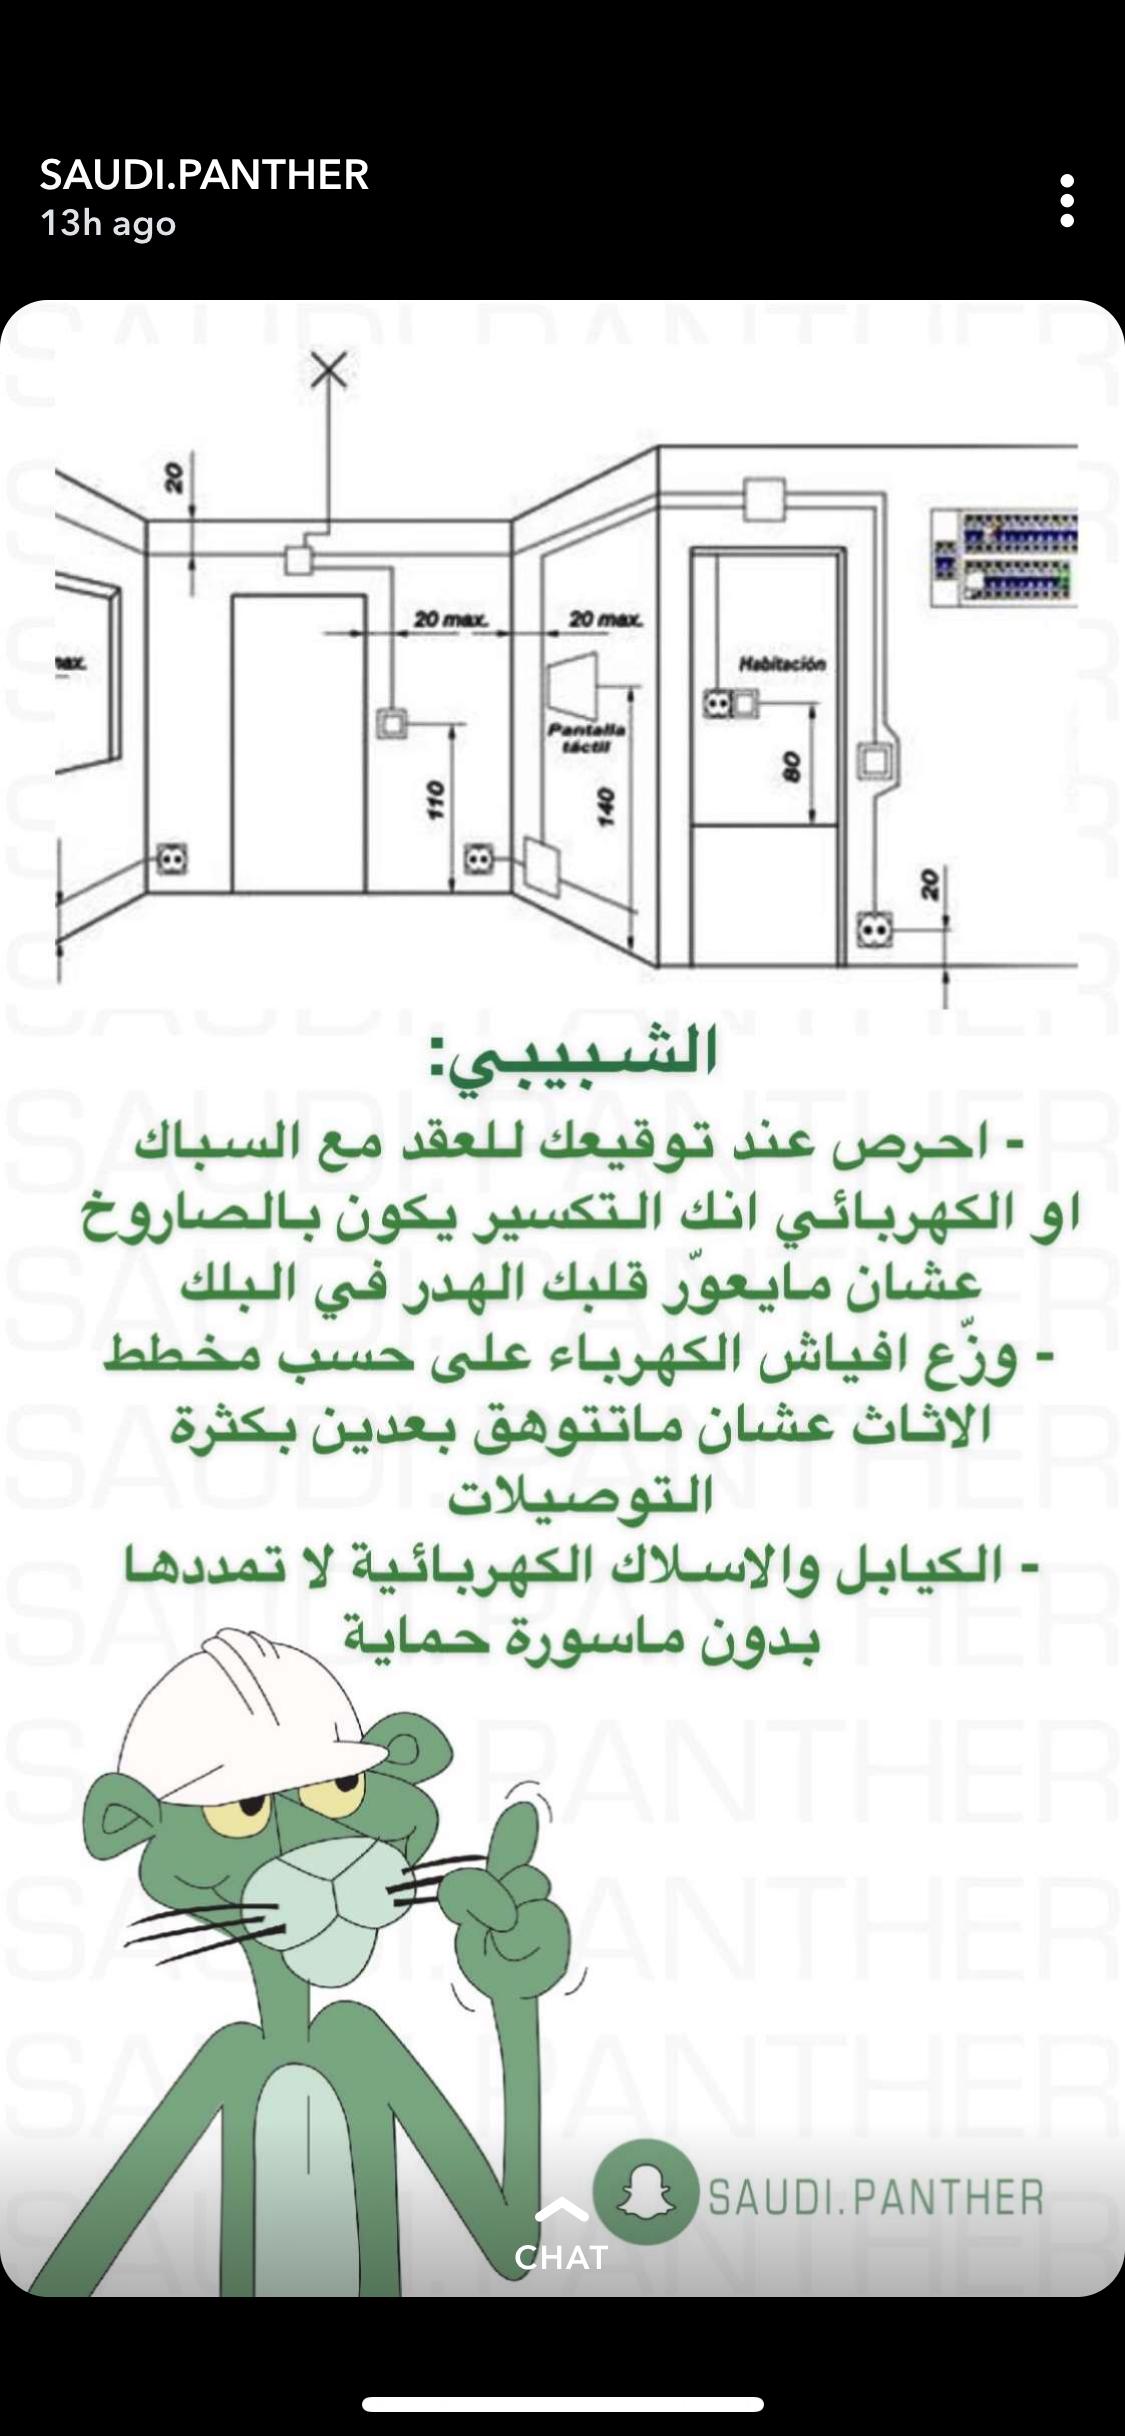 Pin By Sama Saeed On معلومات للبناء Luxury House Interior Design Home Design Decor Living Room Design Decor